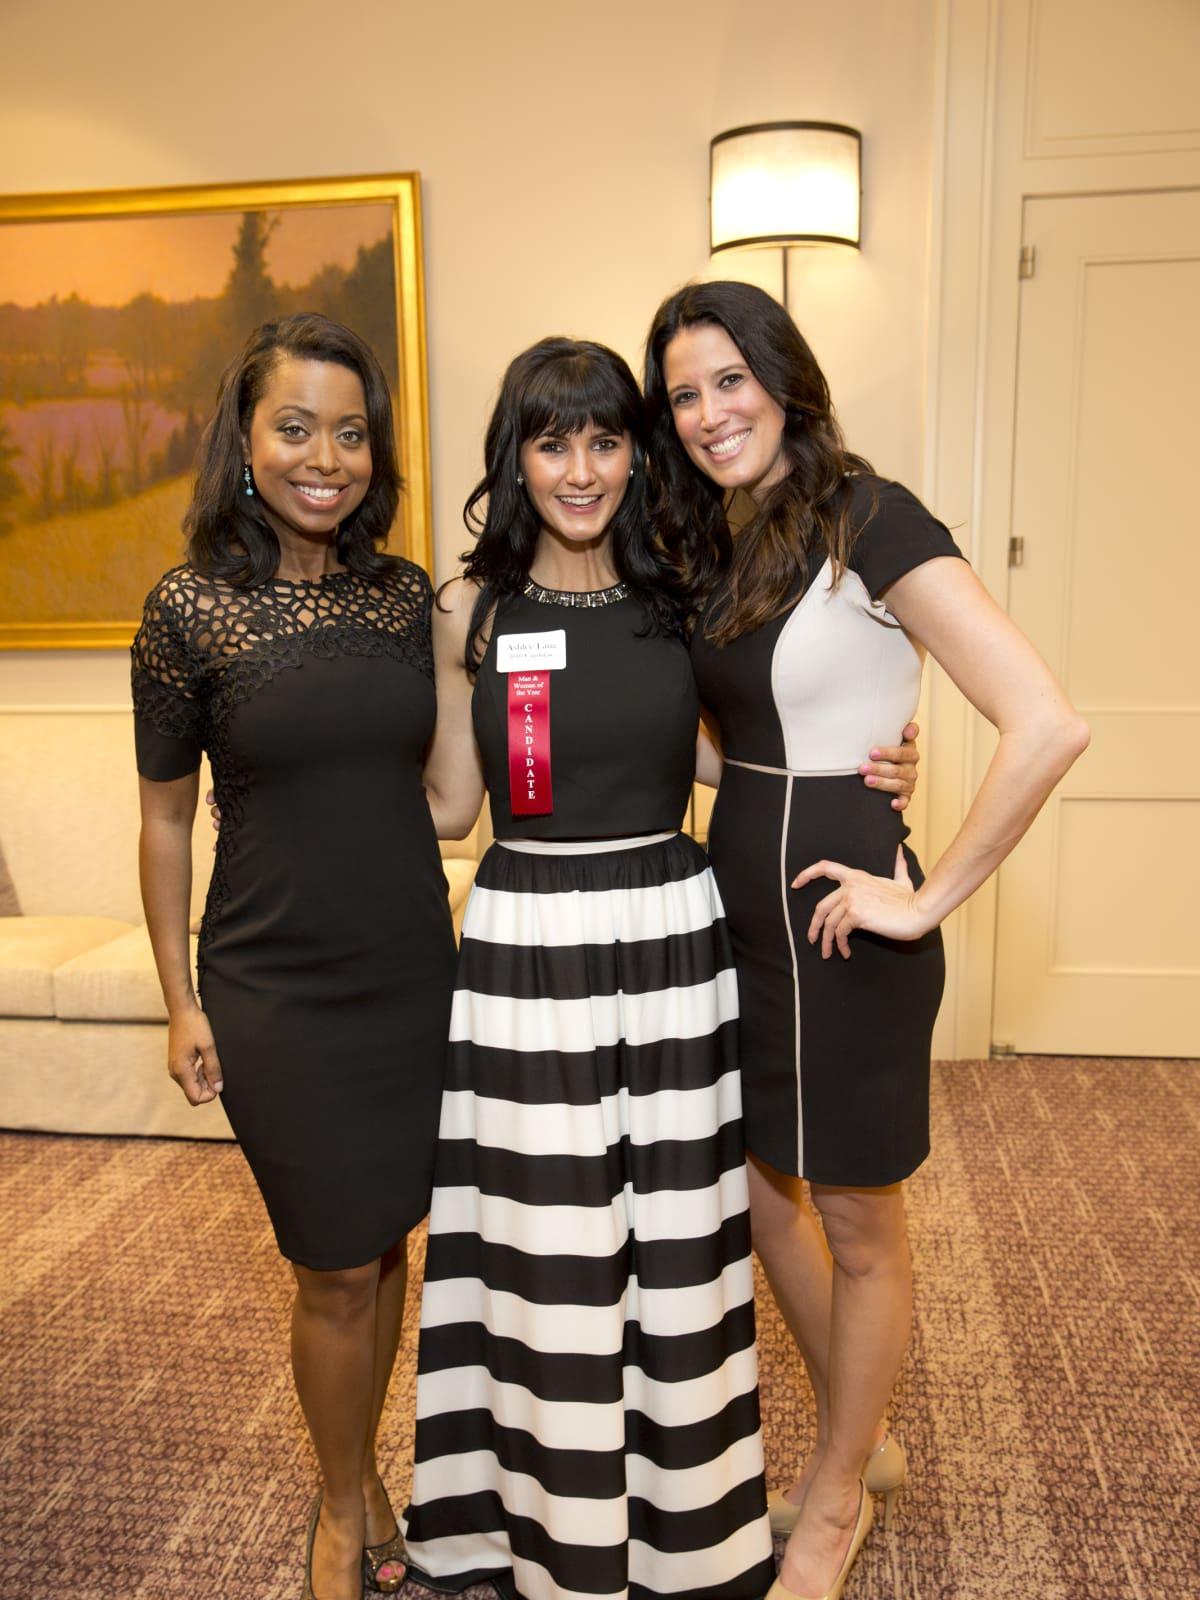 MWOY launch, March 2016,  Melinda Spaulding, Ashlee Lang, Stephanie Taylor